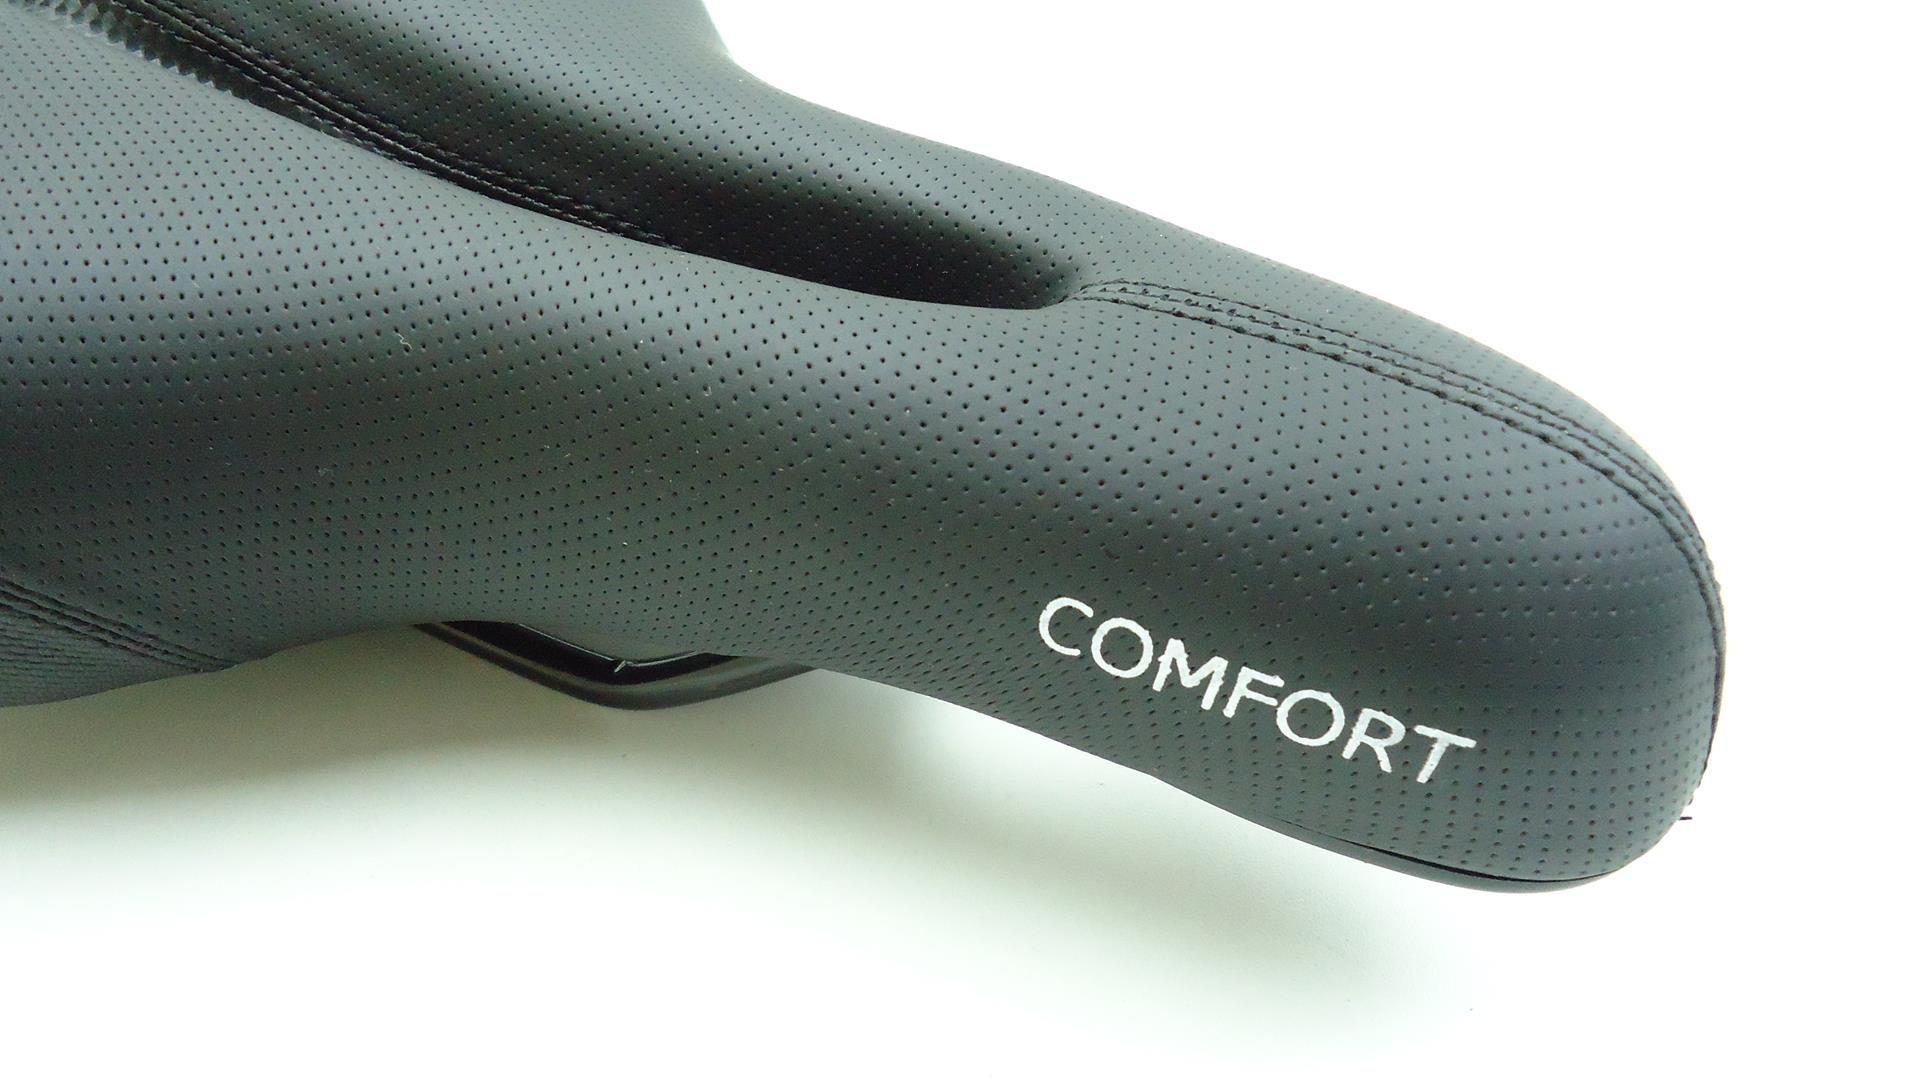 Banco Selim Bicicleta MTB Vortex Confort Vazado 180mm Largura Super Confortável